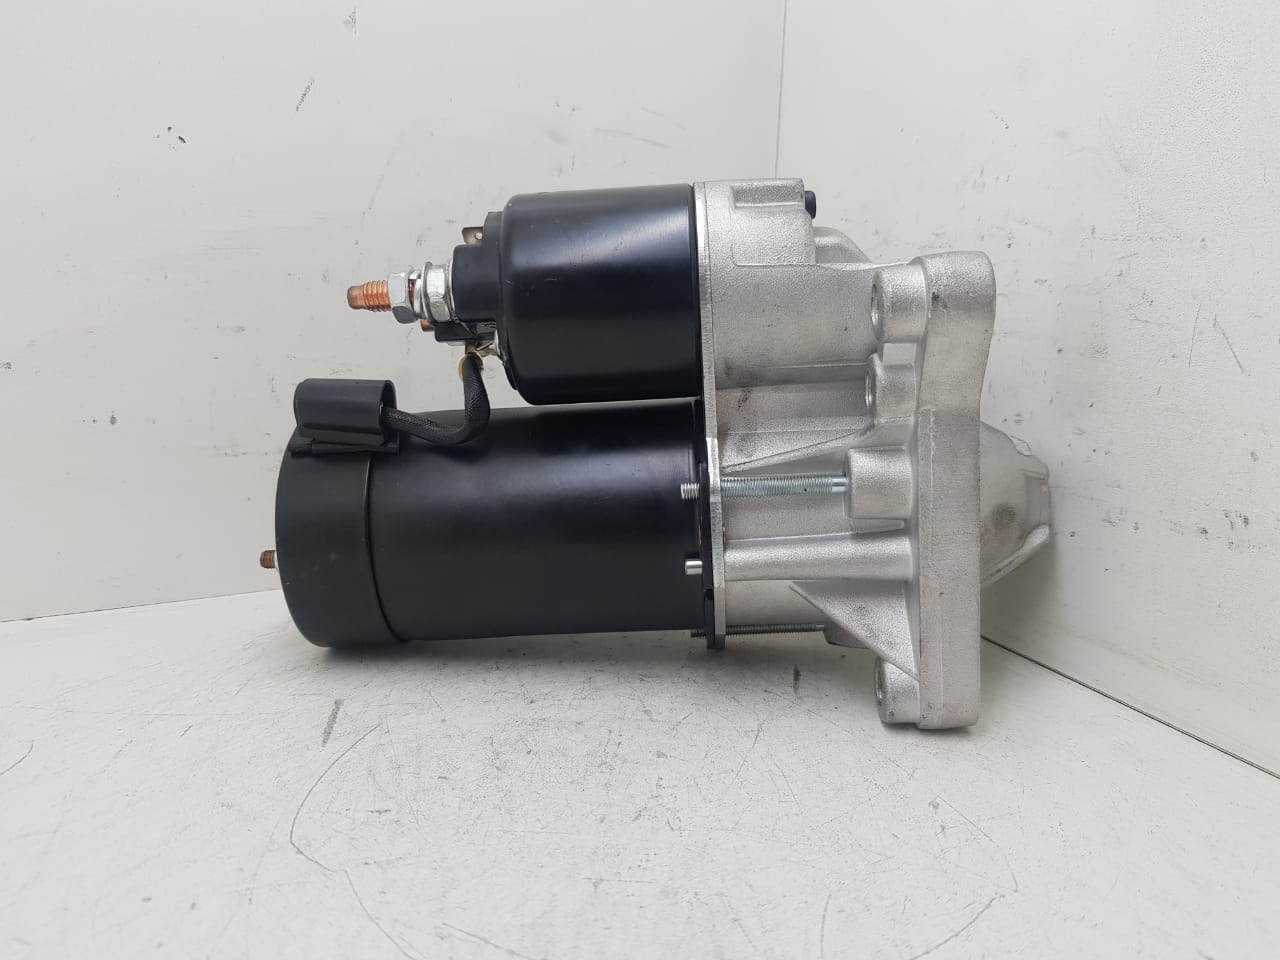 Motor de arranque RENAULT MEGANE LAGUNA SCENIC 12V 10 DENTES D6R4133 20510 0001108143 90000082058 432622  8020101 AEC11038